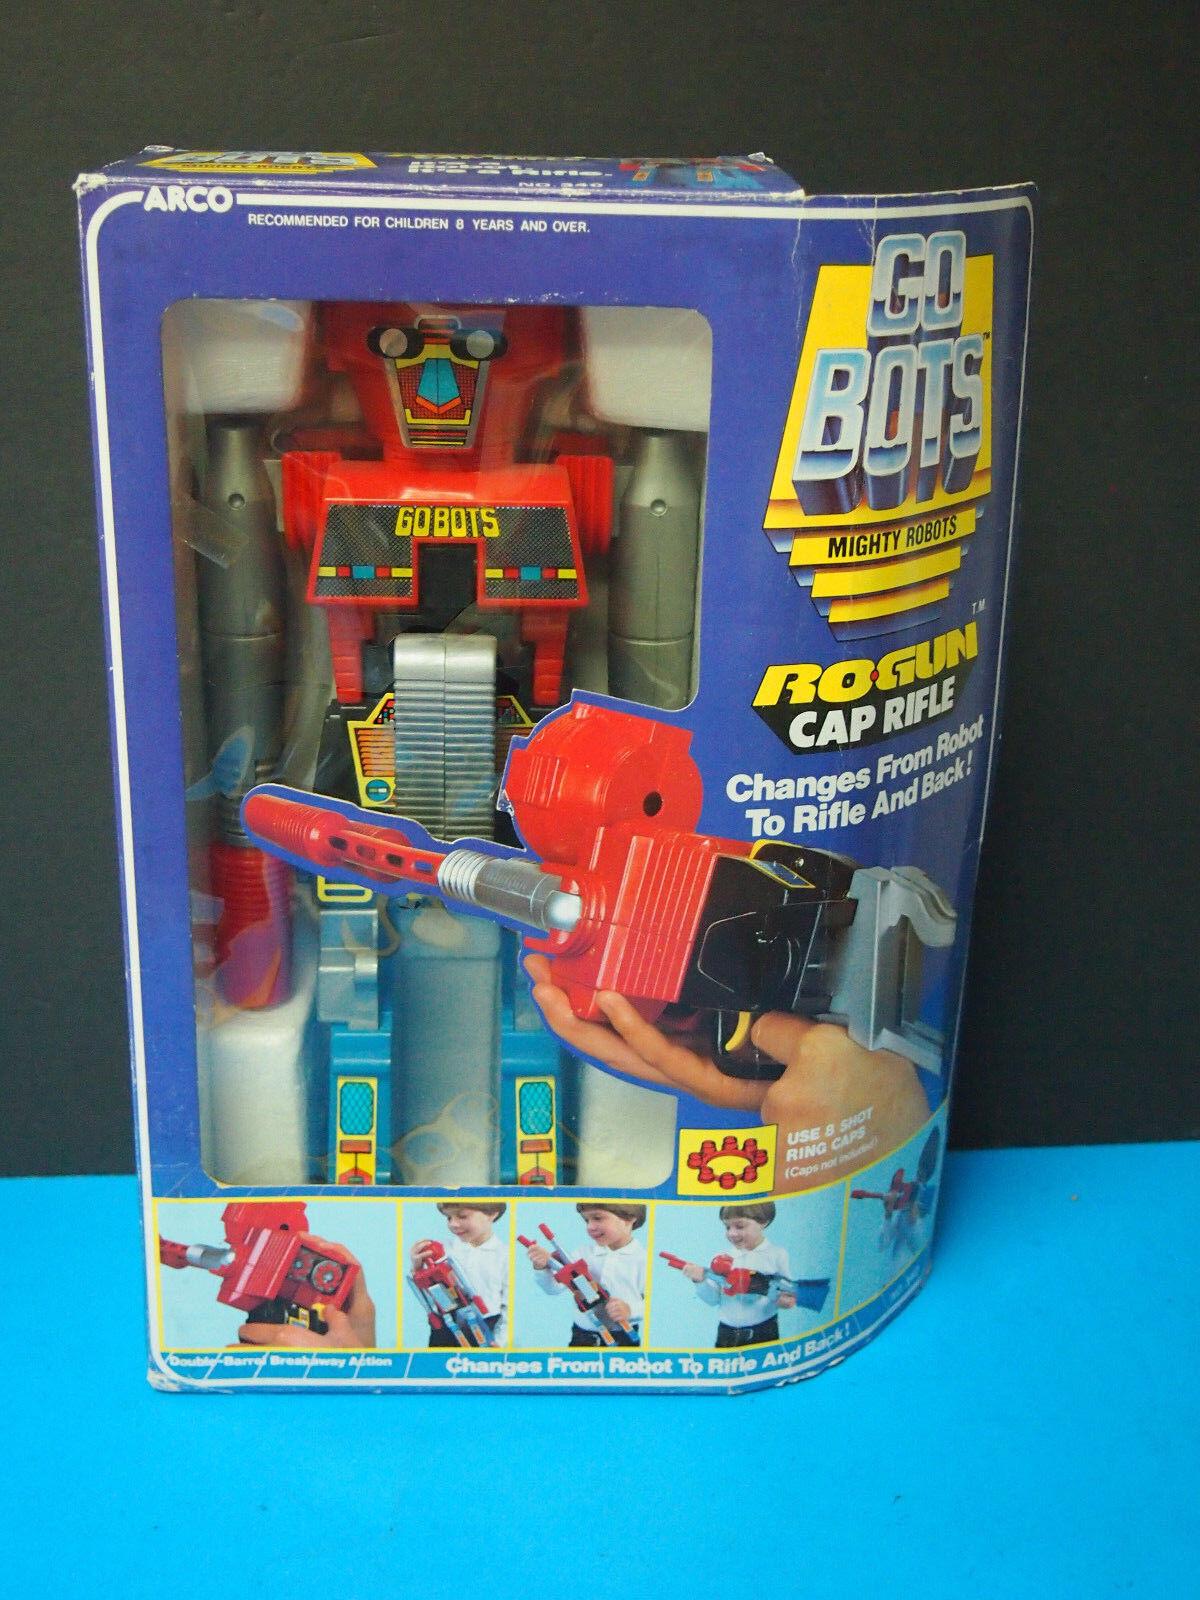 GOBOTS ROGUN Robot Gun Cap Rifle Arco 1984 Mighty Robots